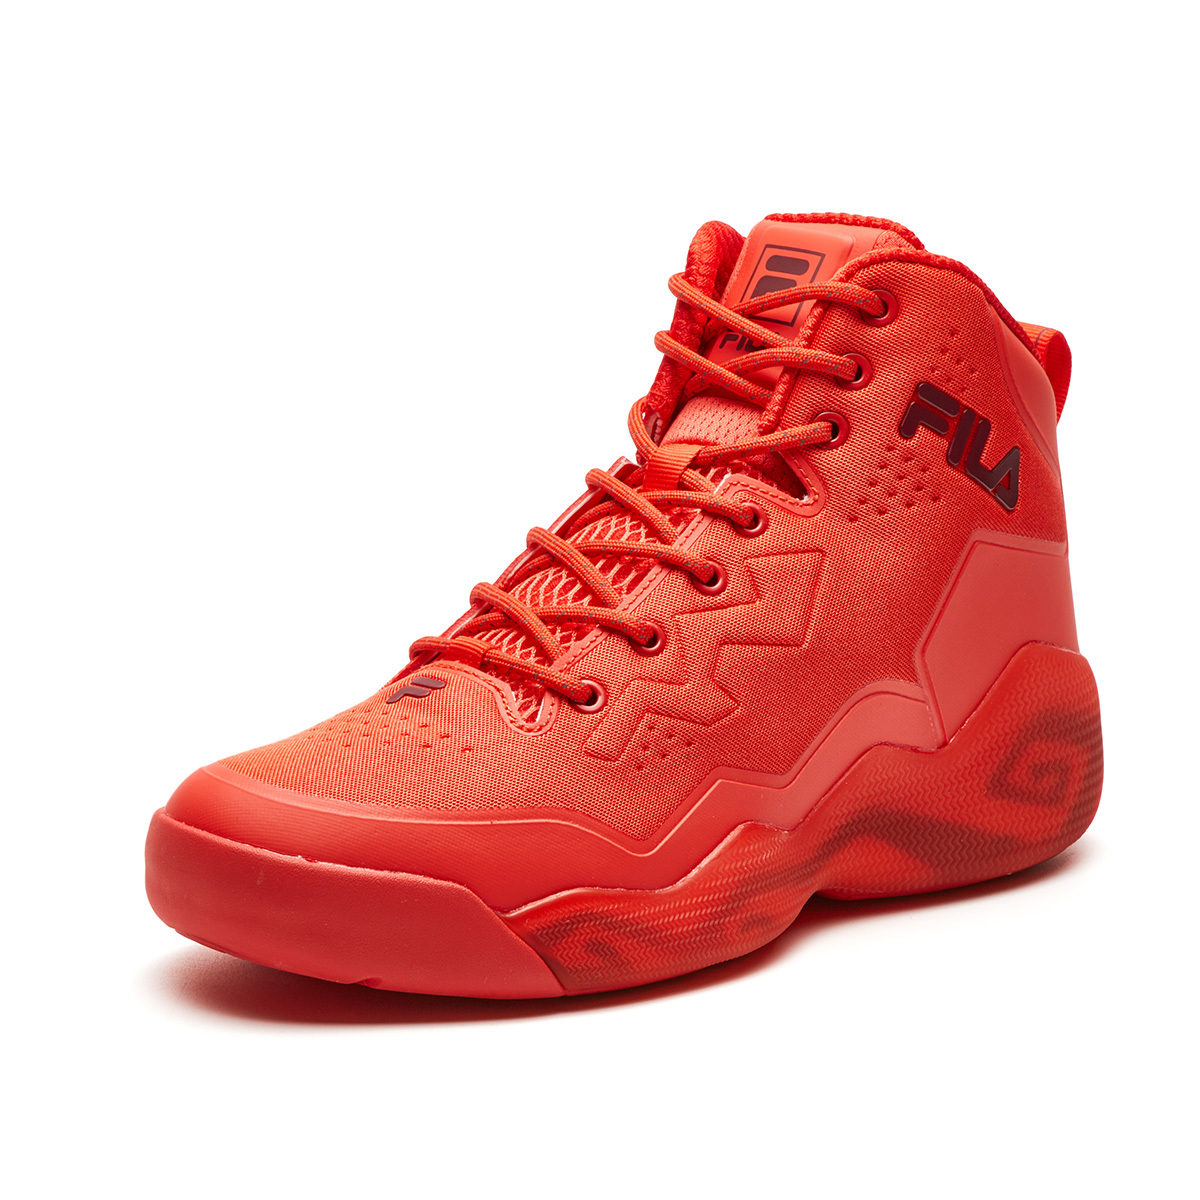 heavy fila basketball shoes mens high gang mb1 boots